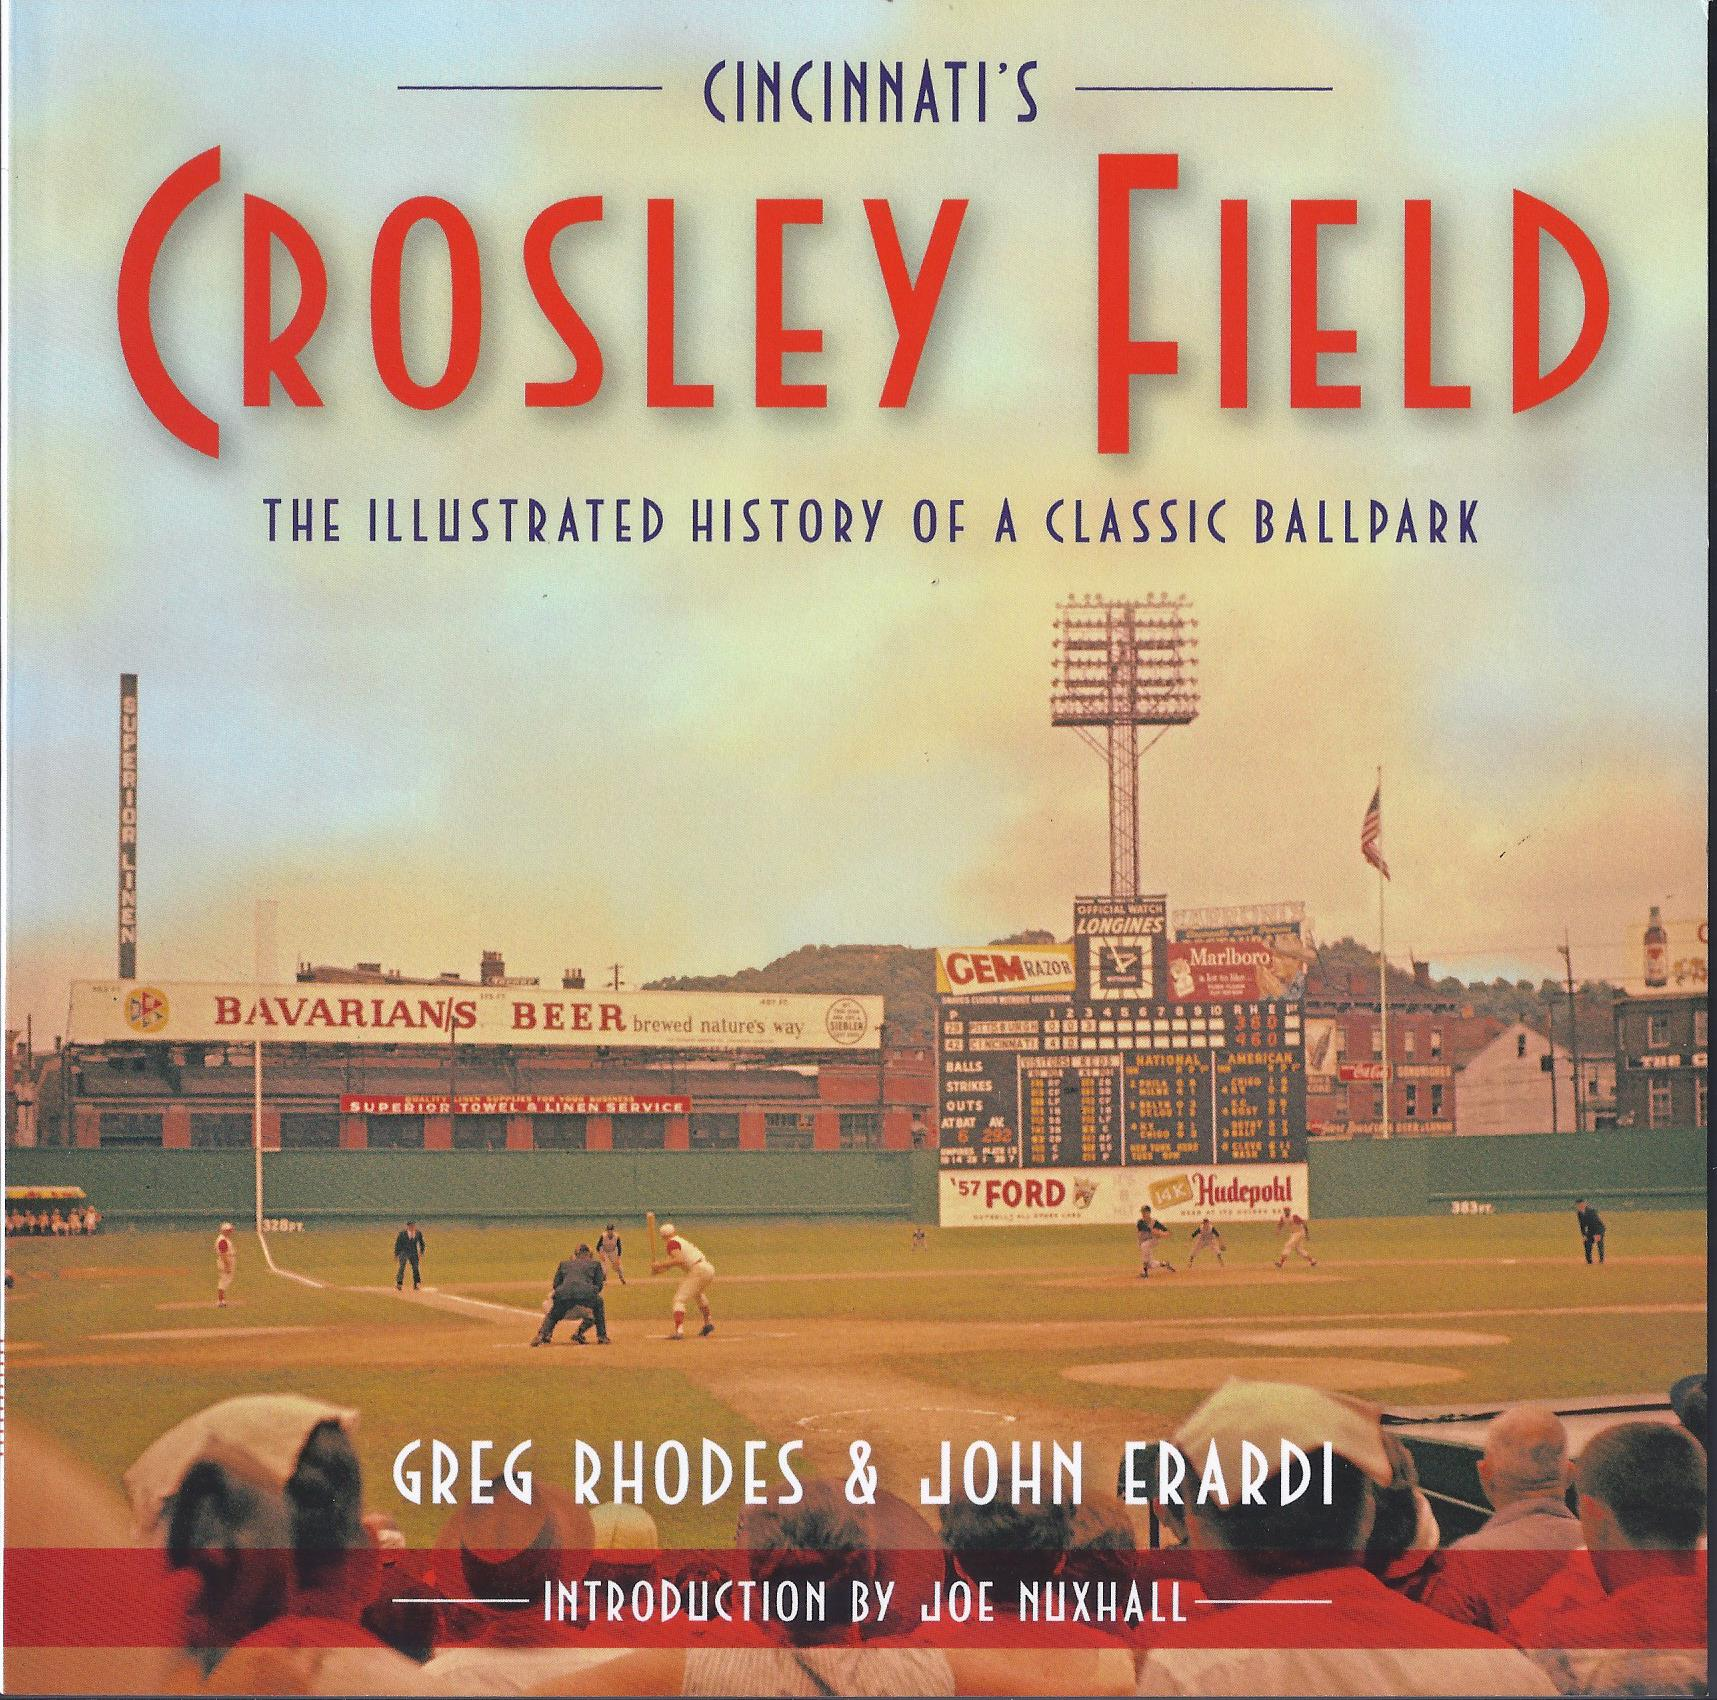 Crosley Field.jpg